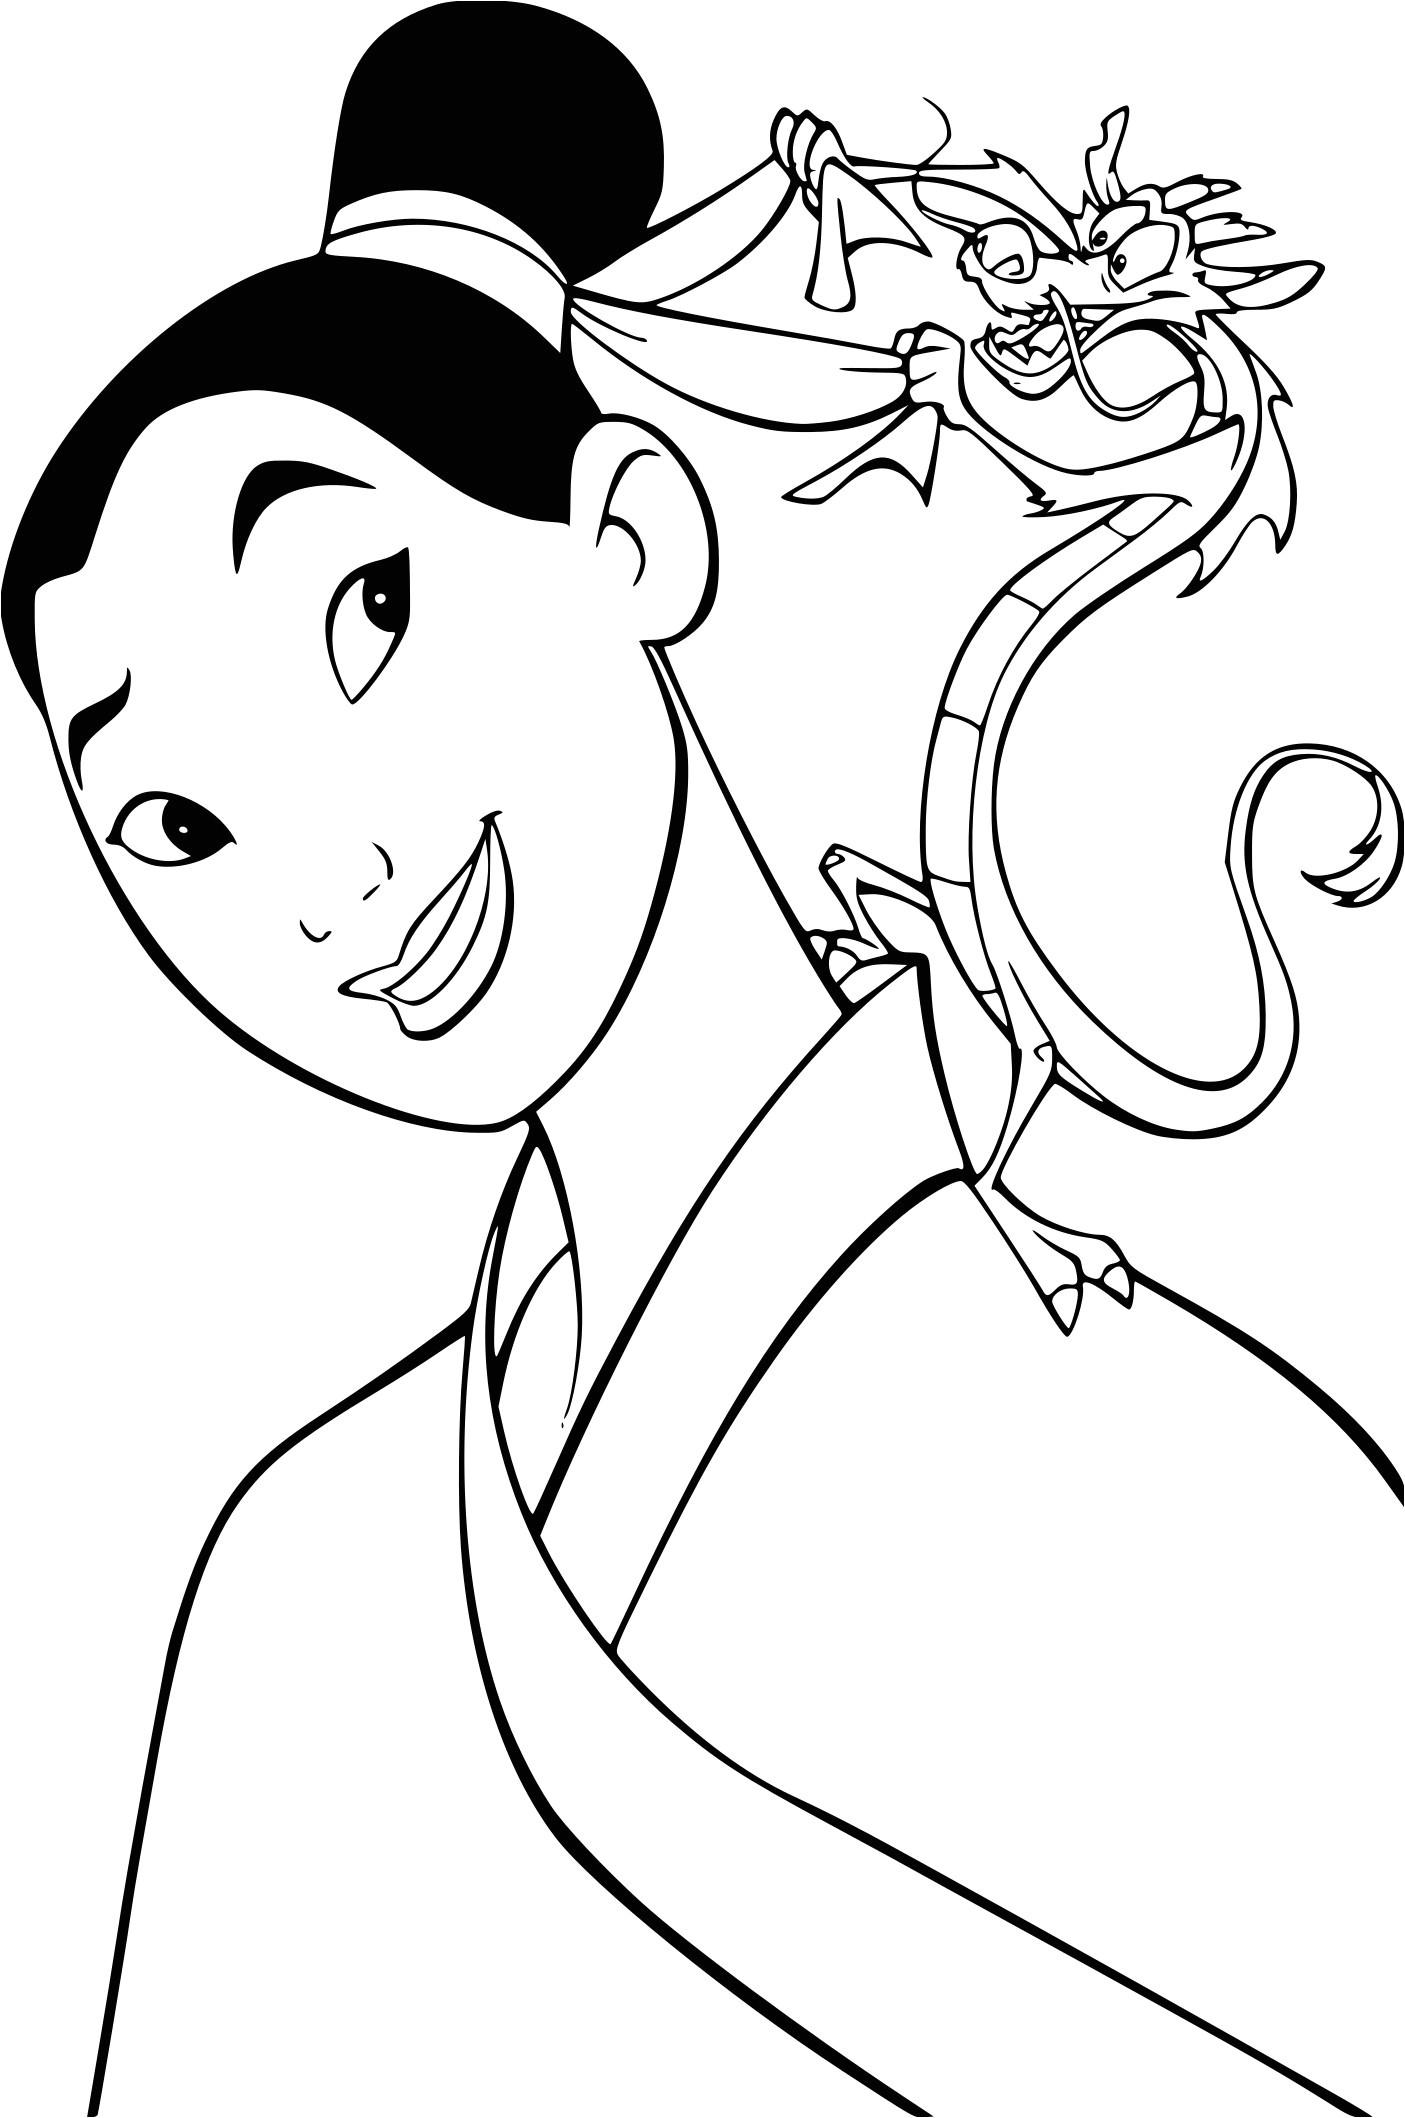 Coloriage A Imprimer Mulan Coloriage Mulan A Imprimer serapportantà Coloriage Mulan A Imprimer